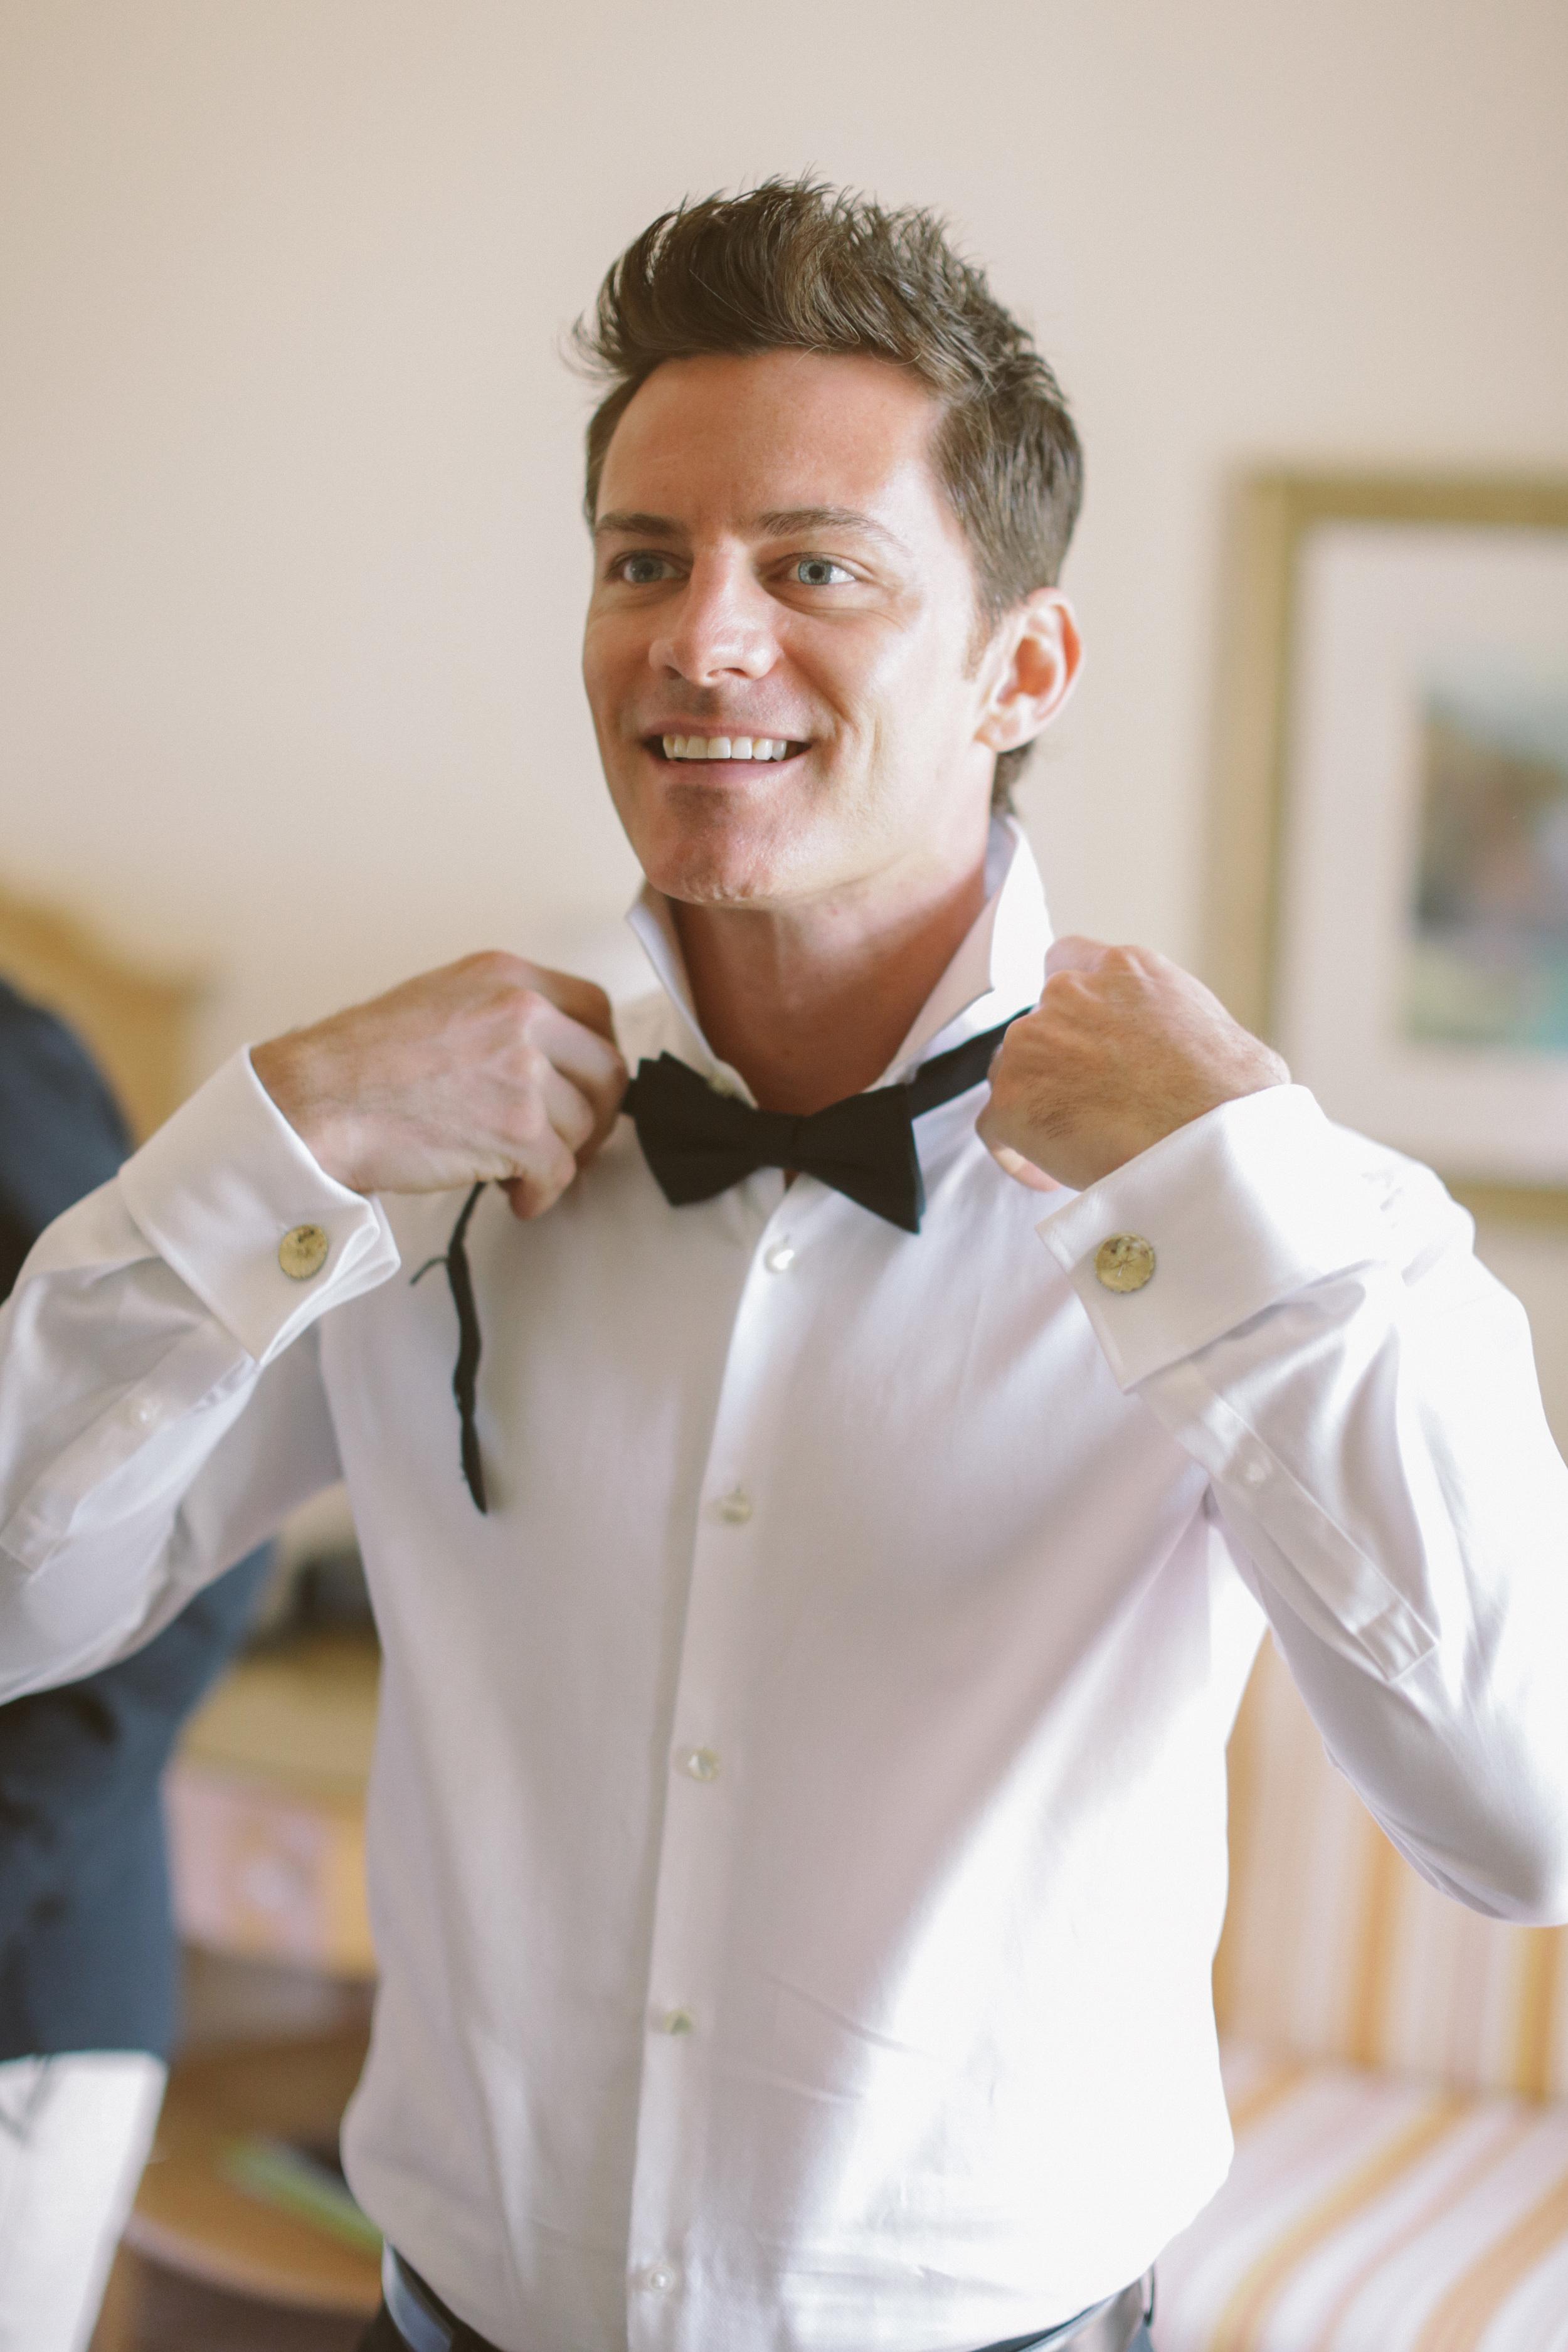 003 groom getting ready 1.jpg